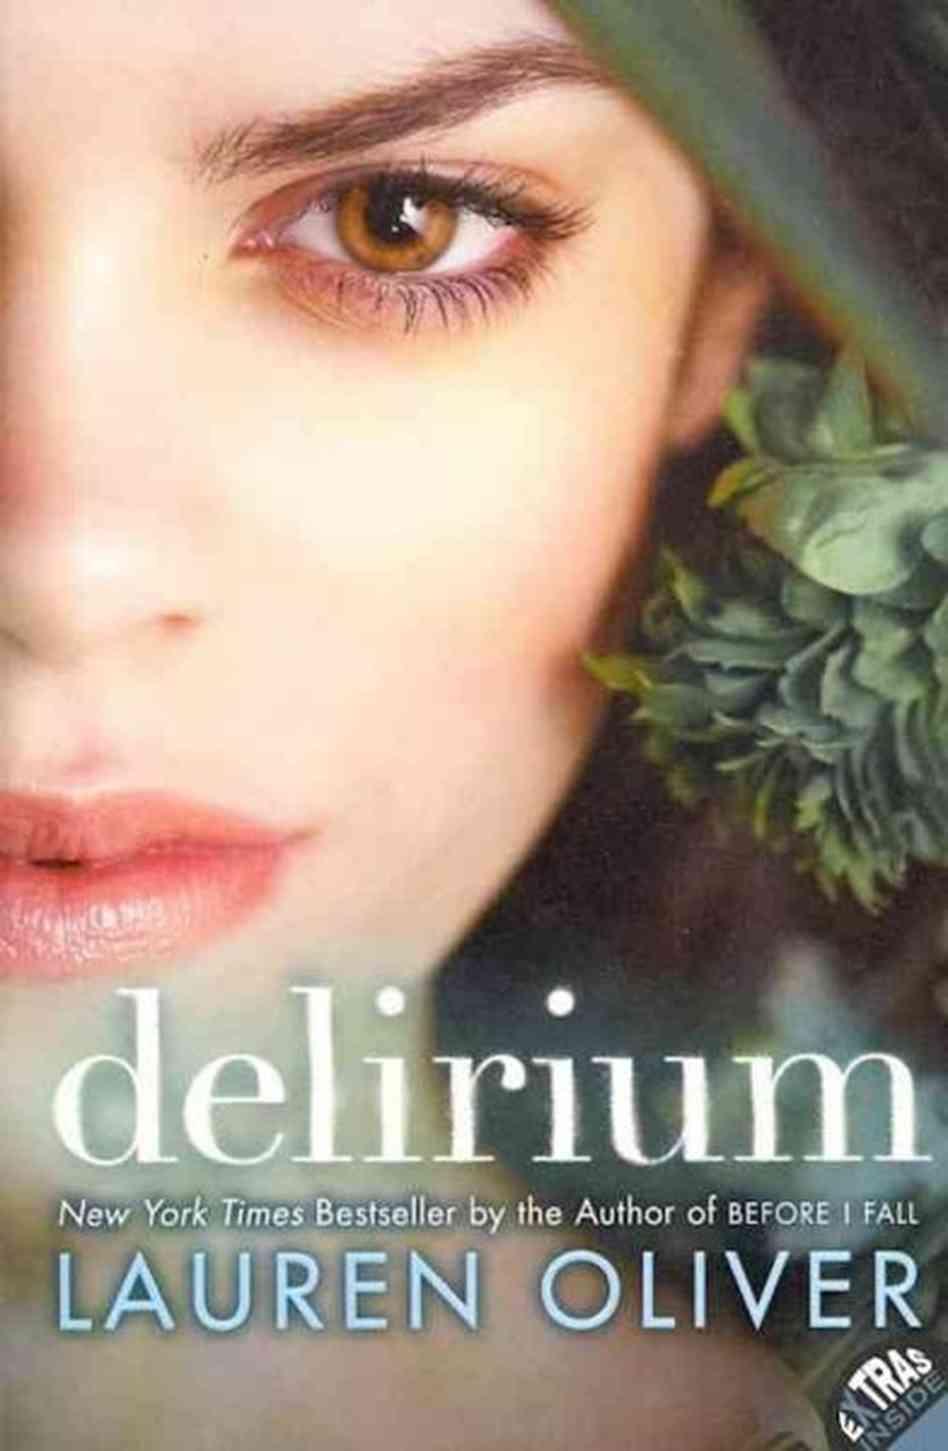 Delirium Lauren Oliver  Reviewed  Adventures of a London Kiwi